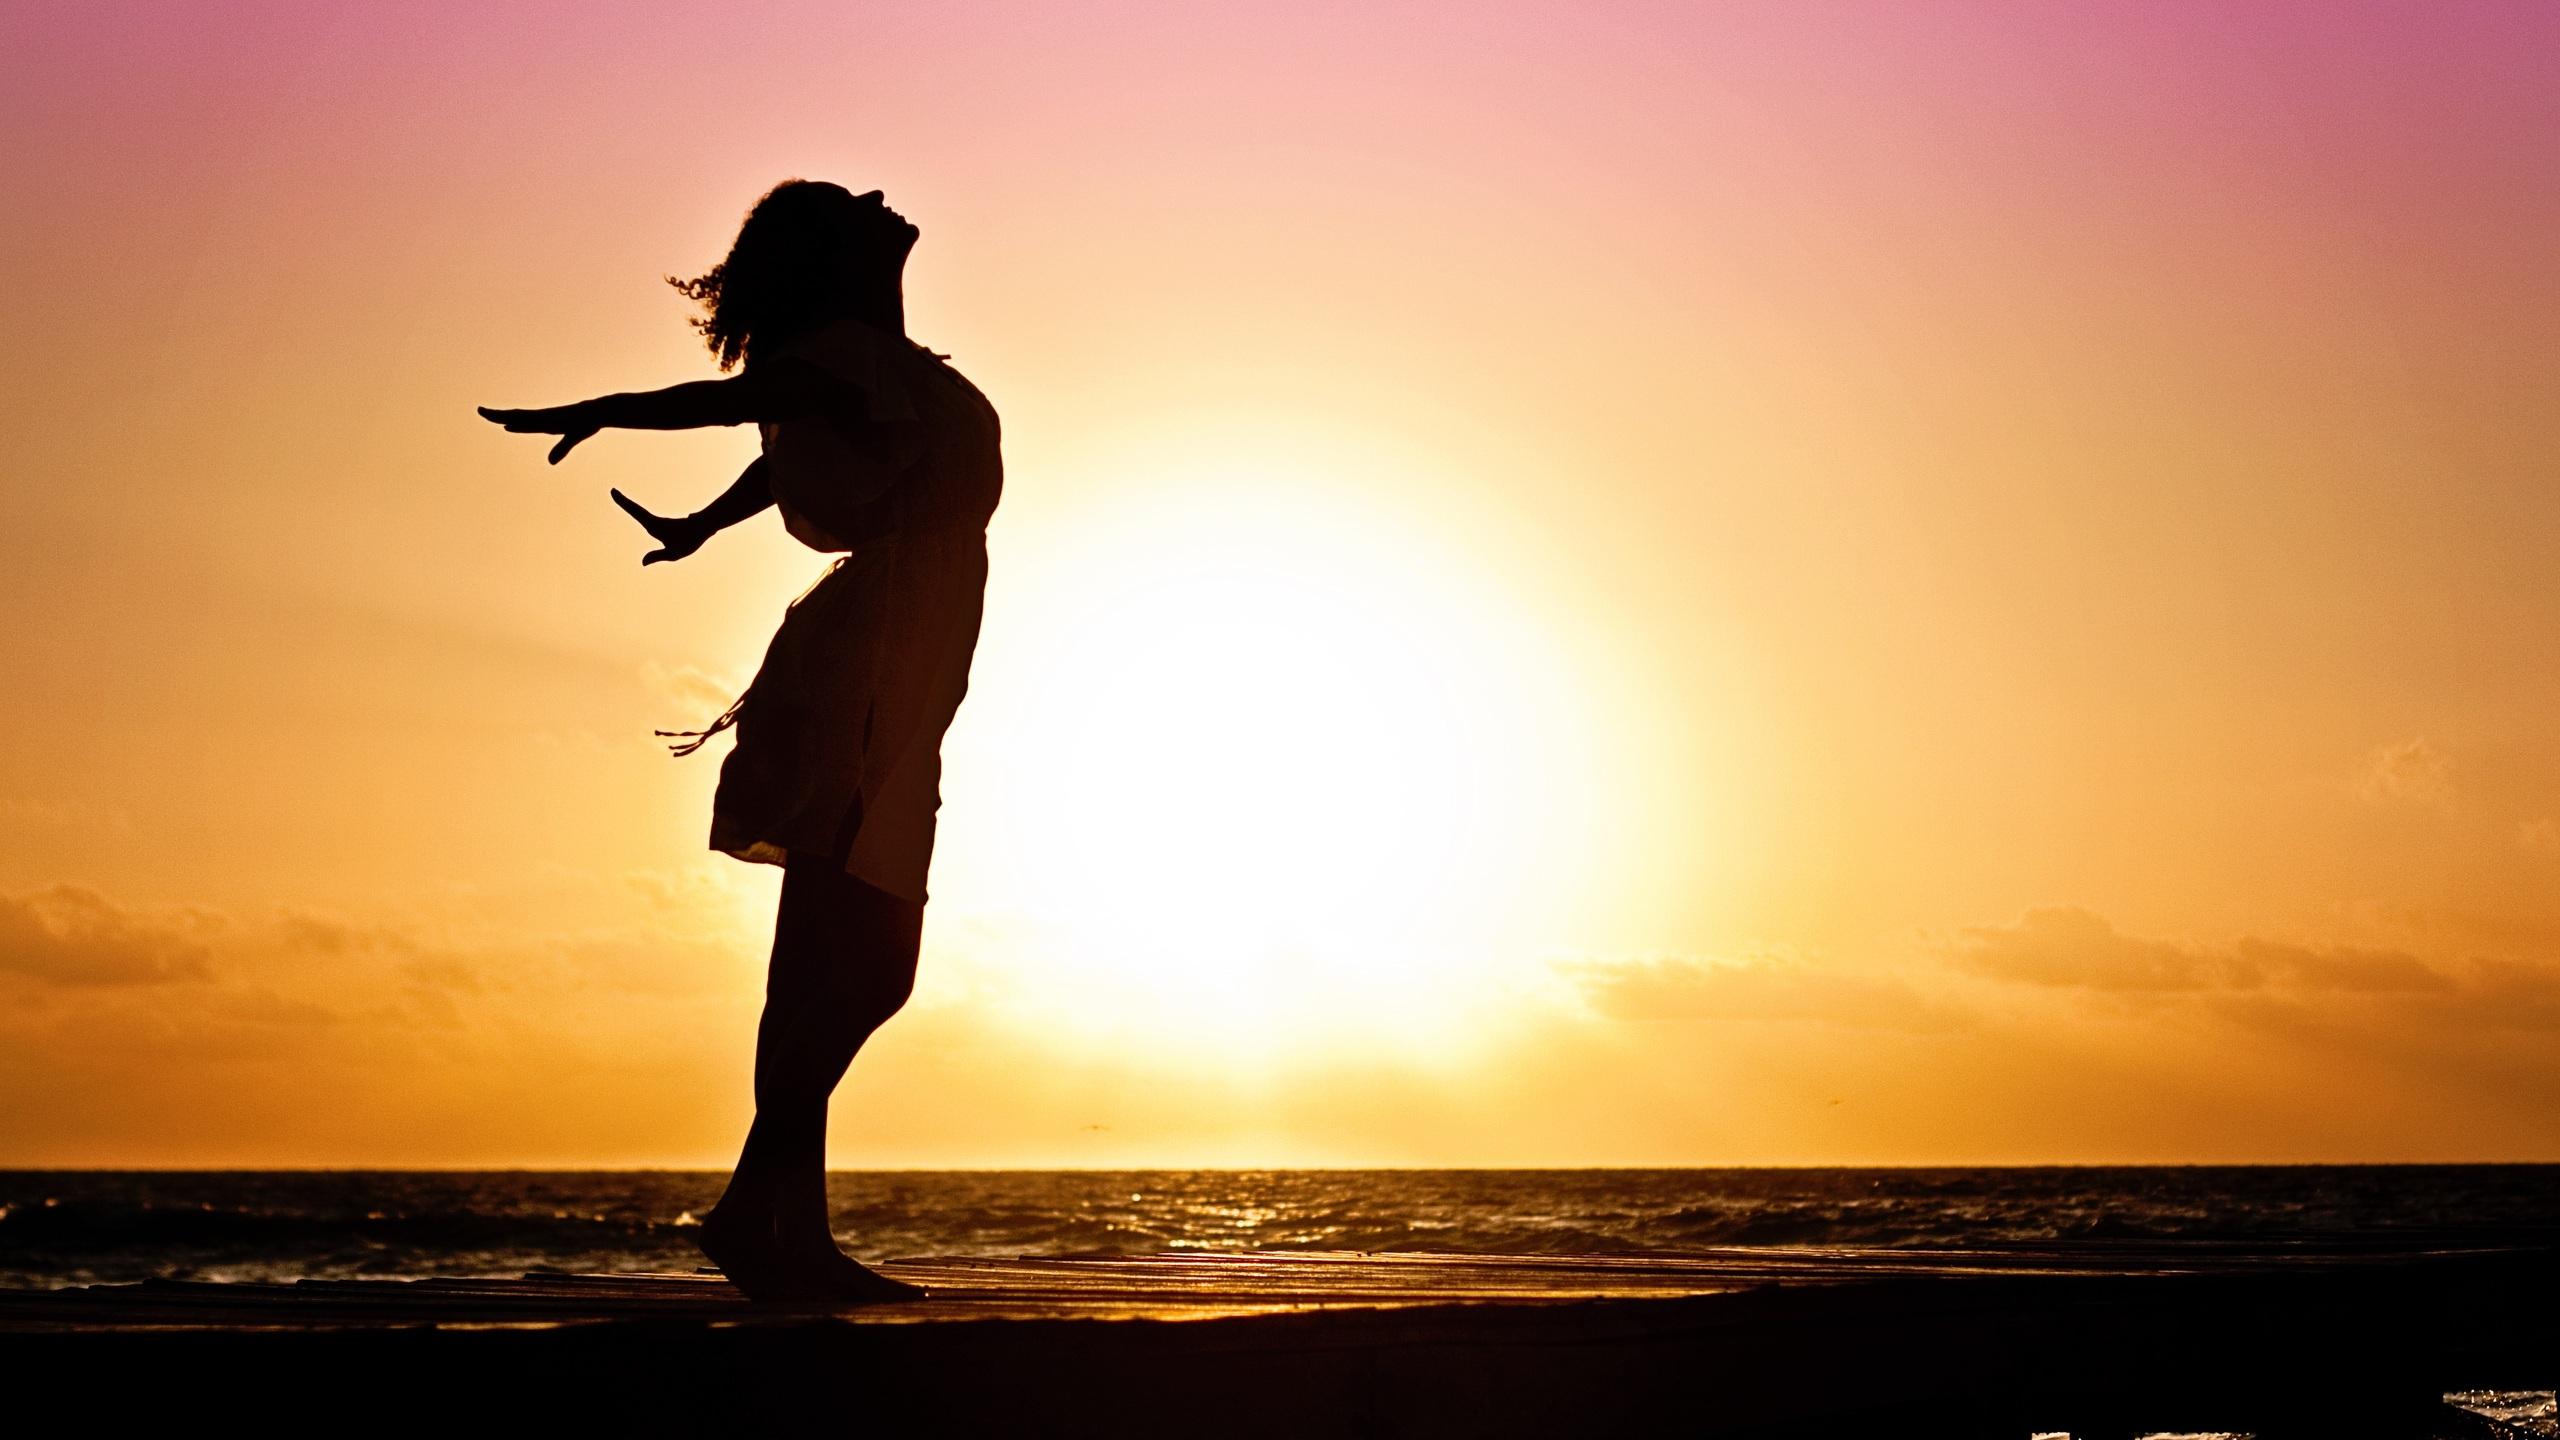 2560x1440 Girl Happiness Sunrise Shore 1440p Resolution Hd